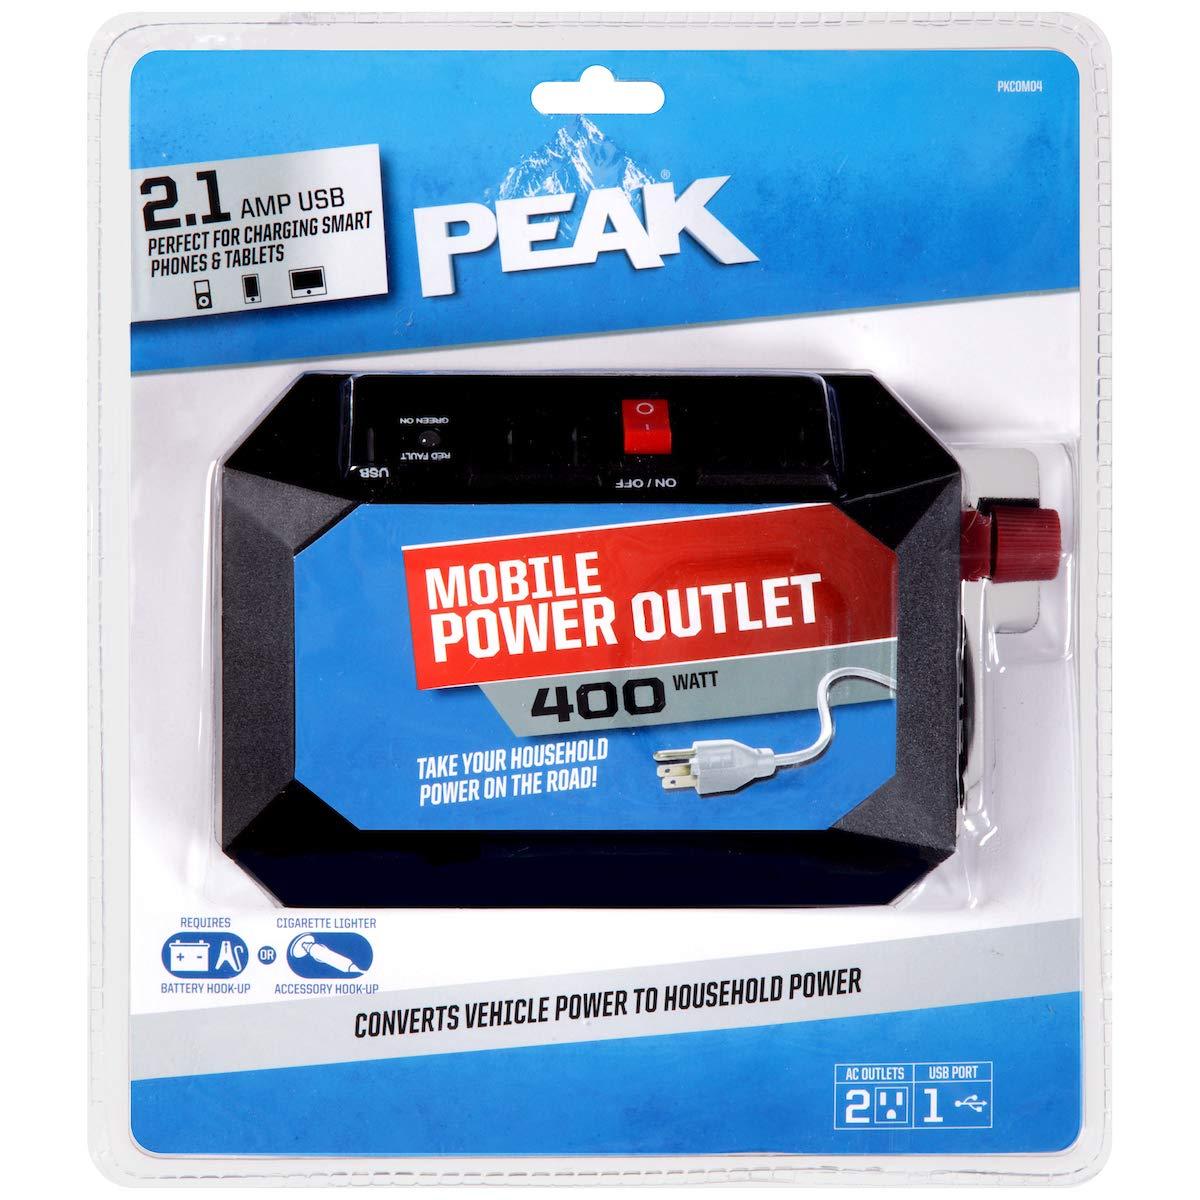 PEAK Mobile Power Outlet, 400 Watt